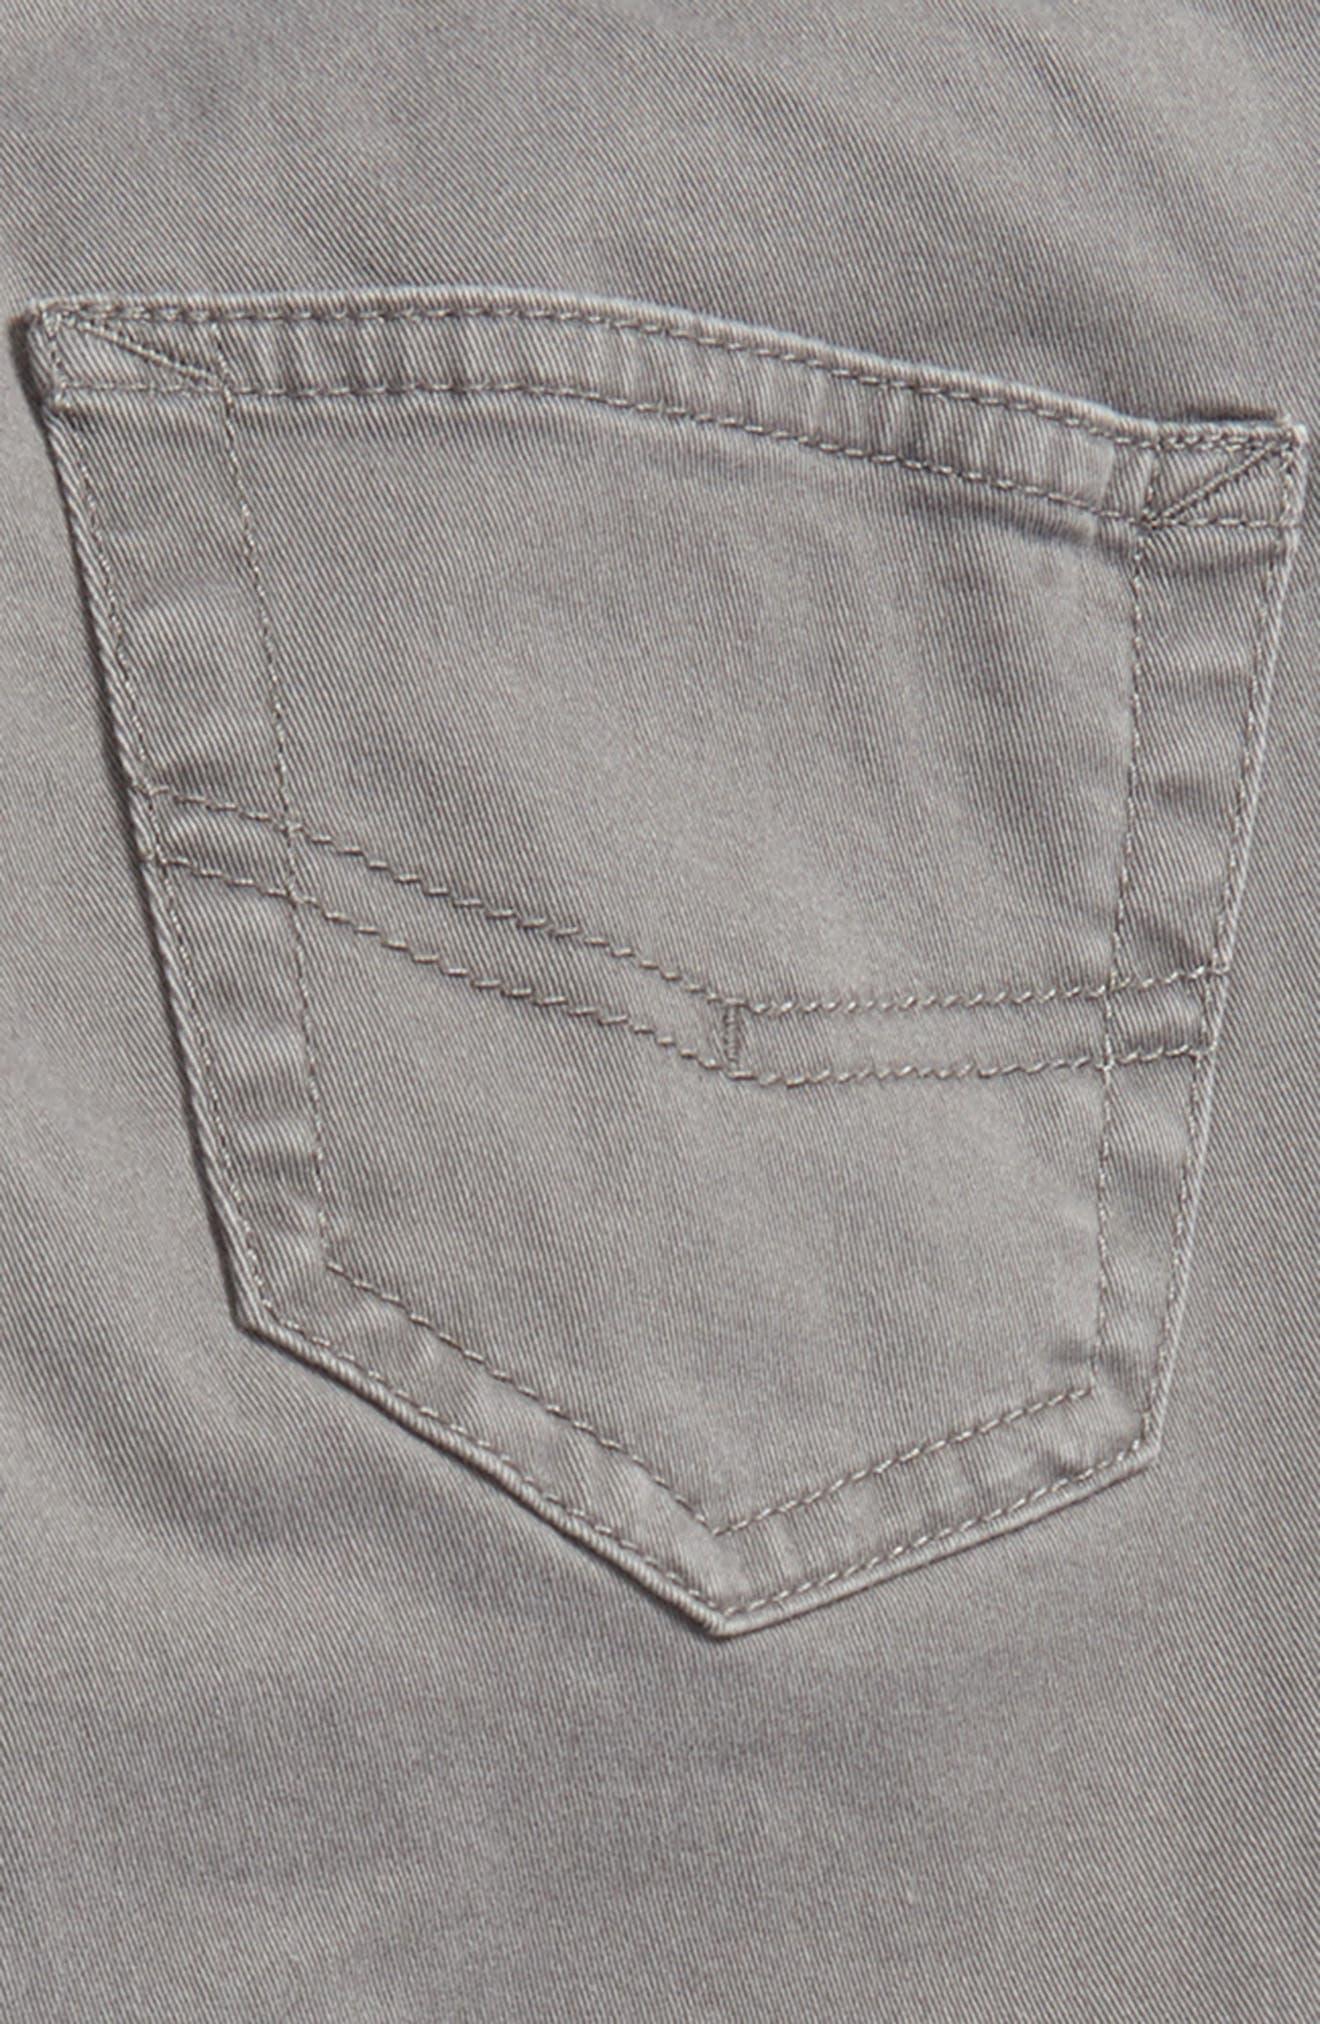 TUCKER + TATE,                             Twill Pants,                             Alternate thumbnail 3, color,                             021